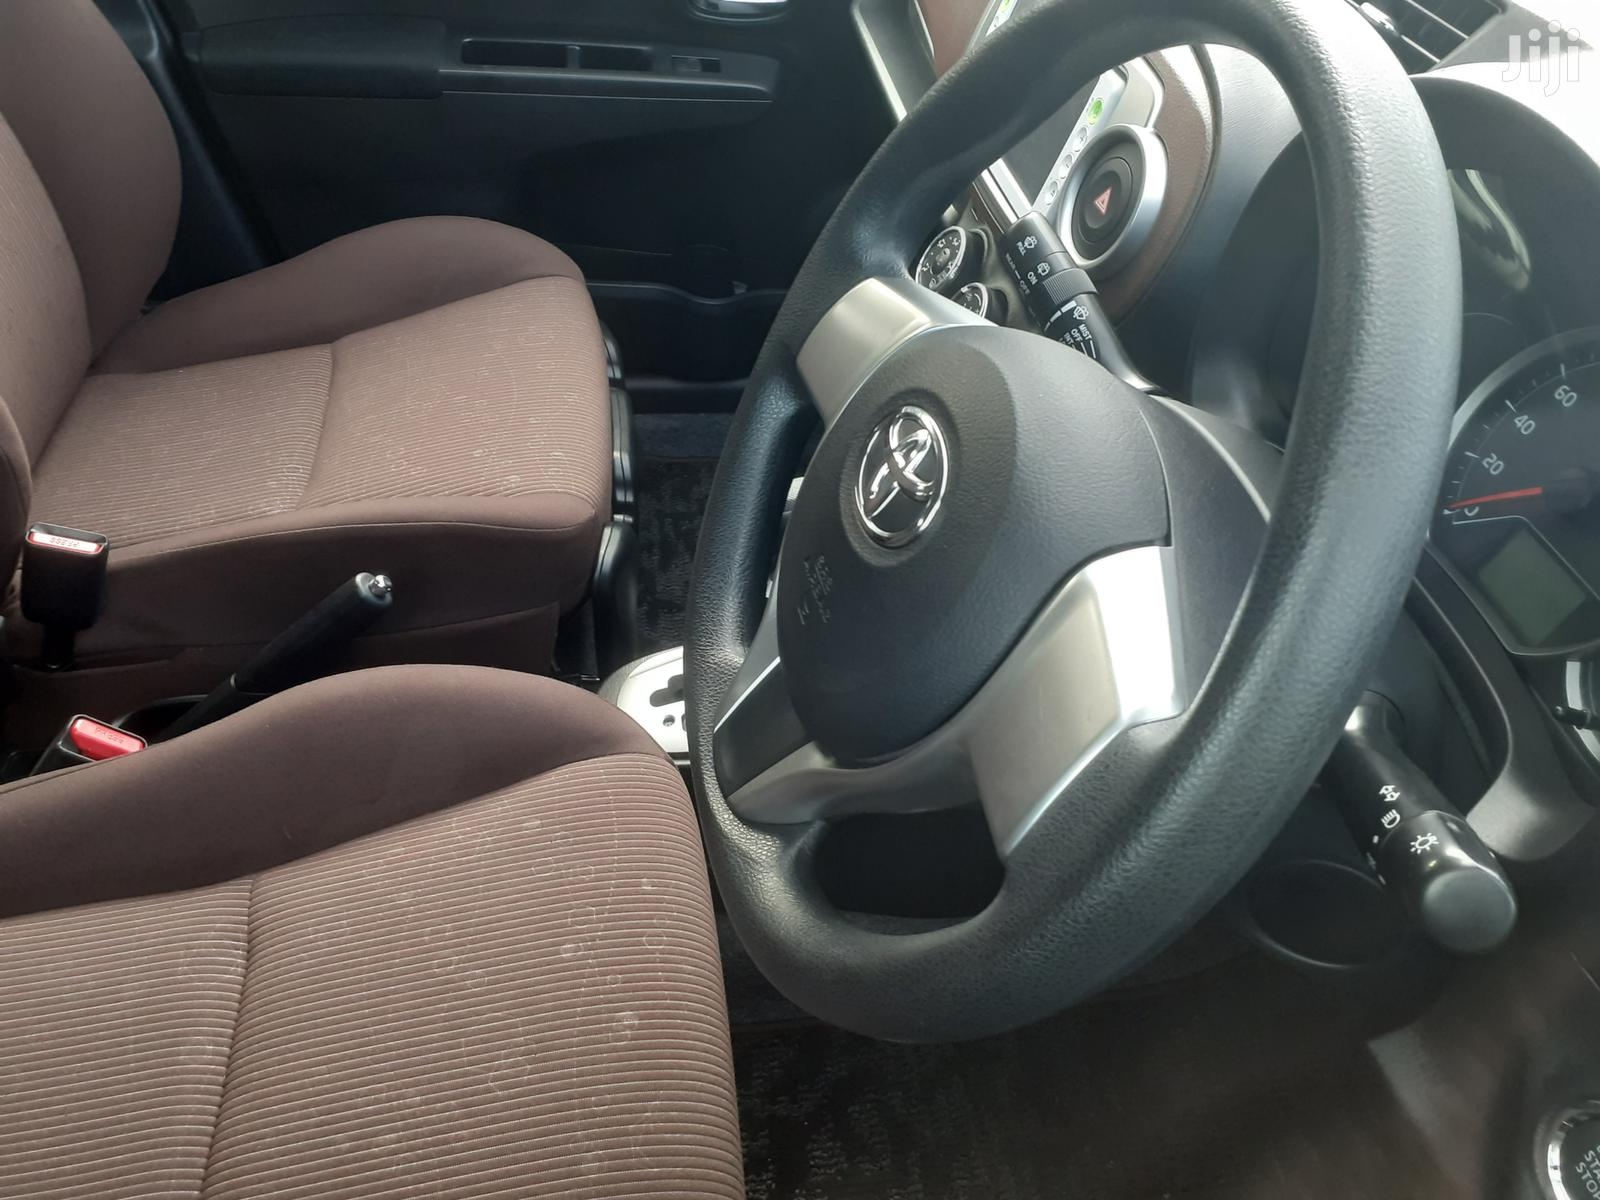 Toyota Vitz 2012 Brown | Cars for sale in Shimanzi/Ganjoni, Mombasa, Kenya